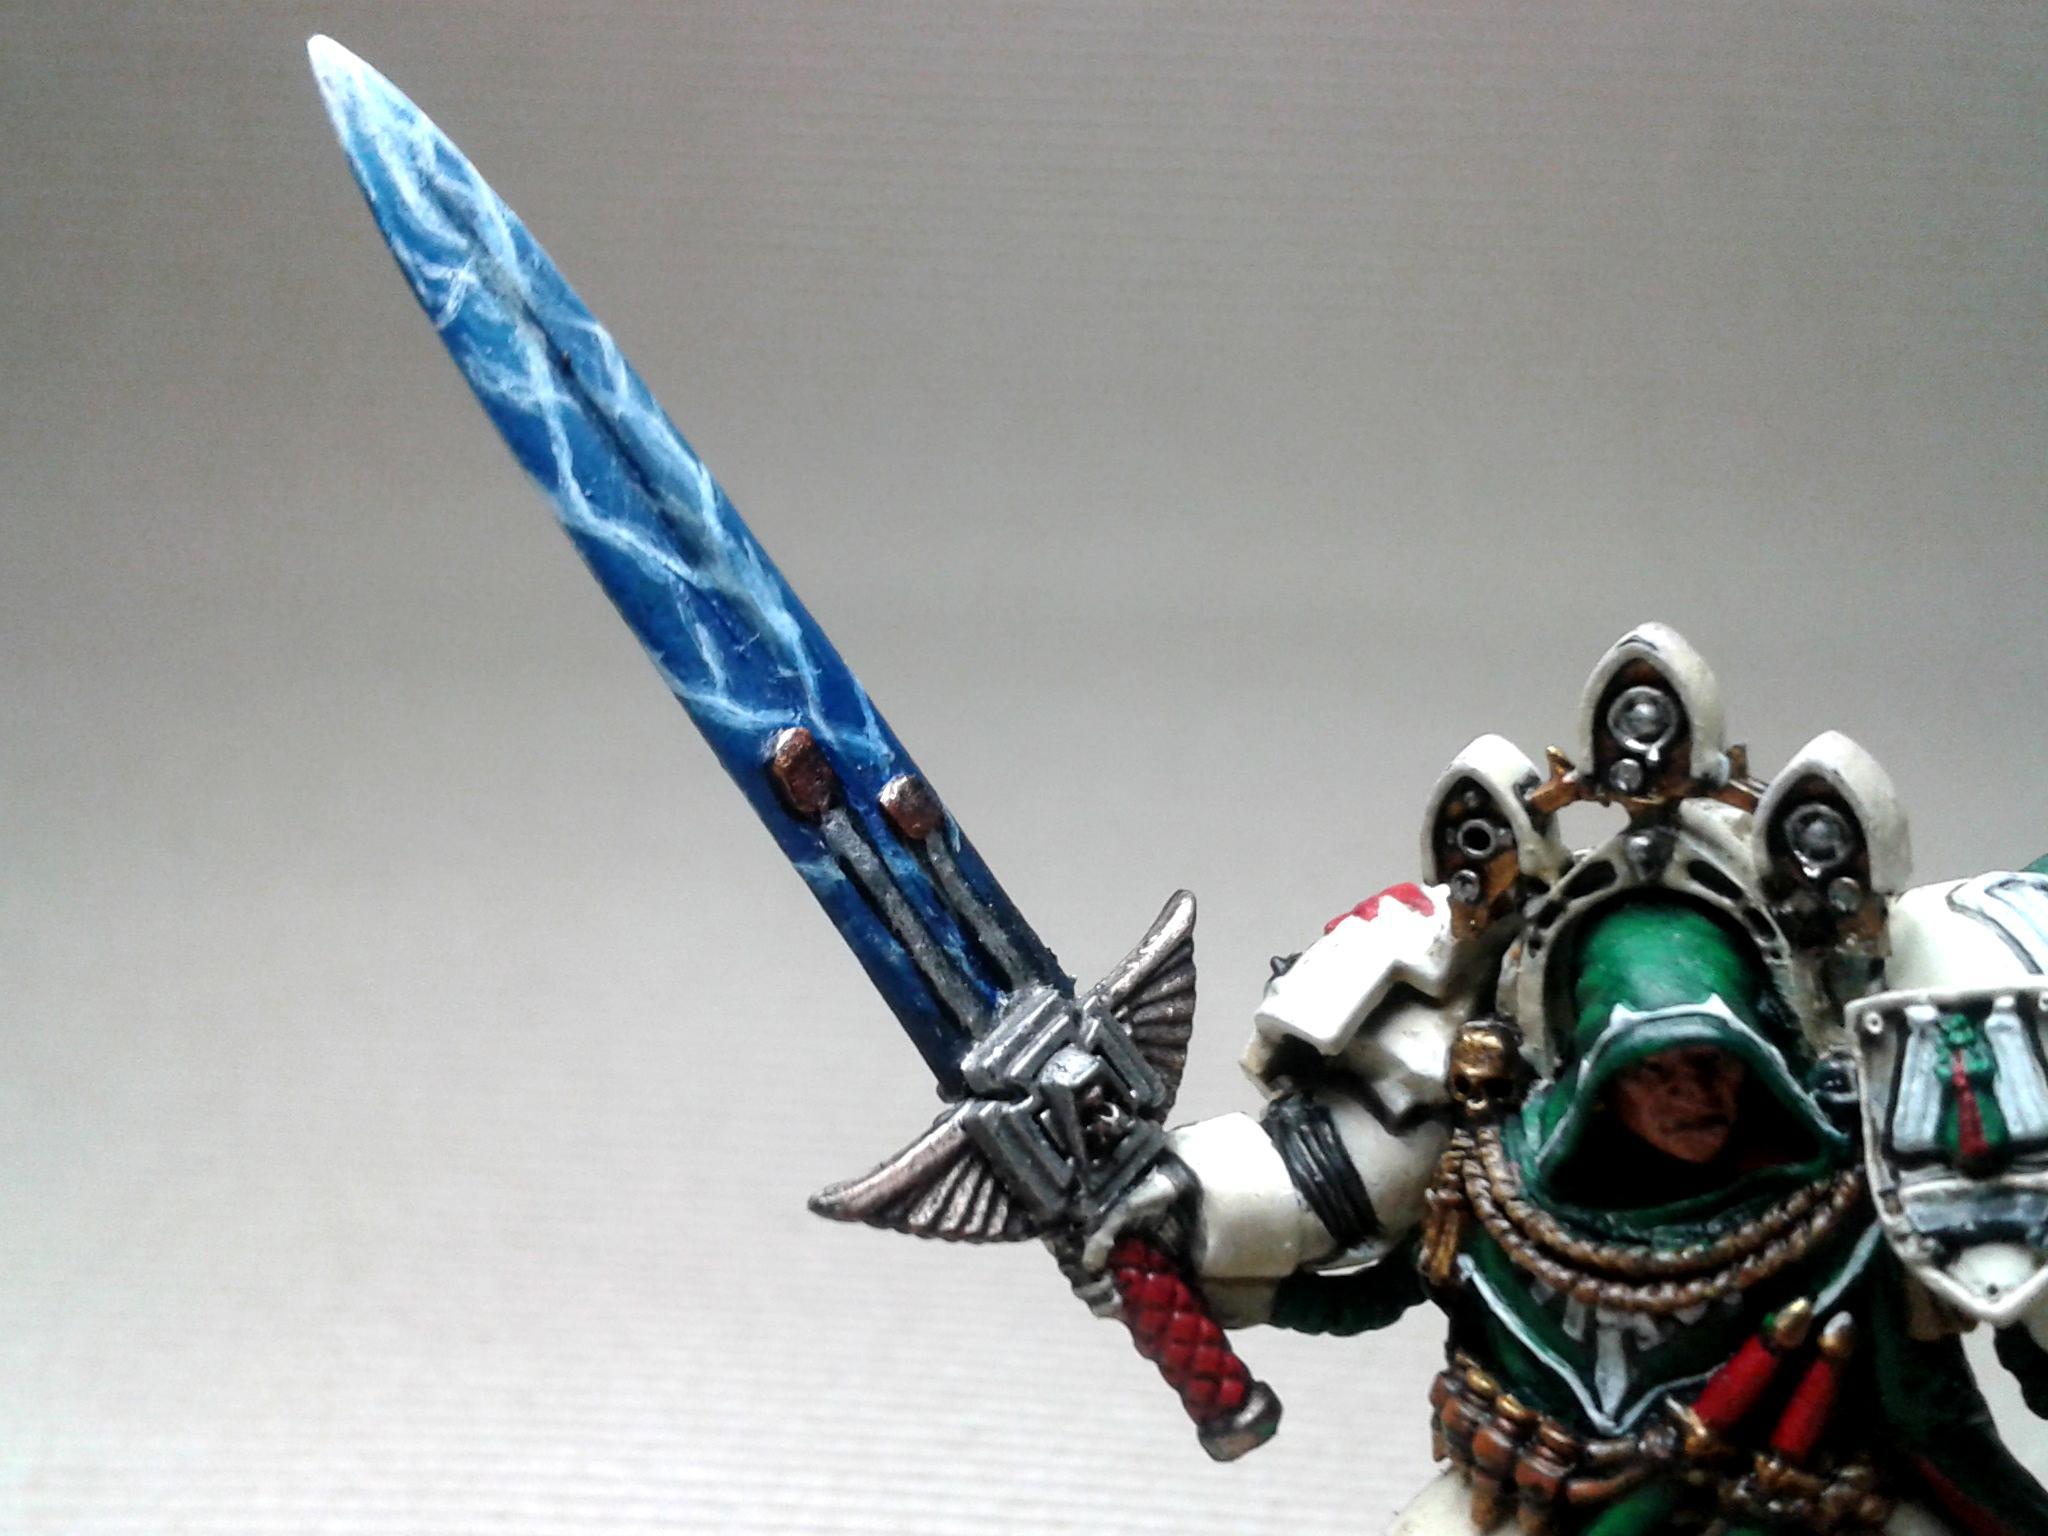 40.000, Convertions, Dark Angels, Deathwing, Merlin, Ravenwing, Space Marines, Warhammer 40,000